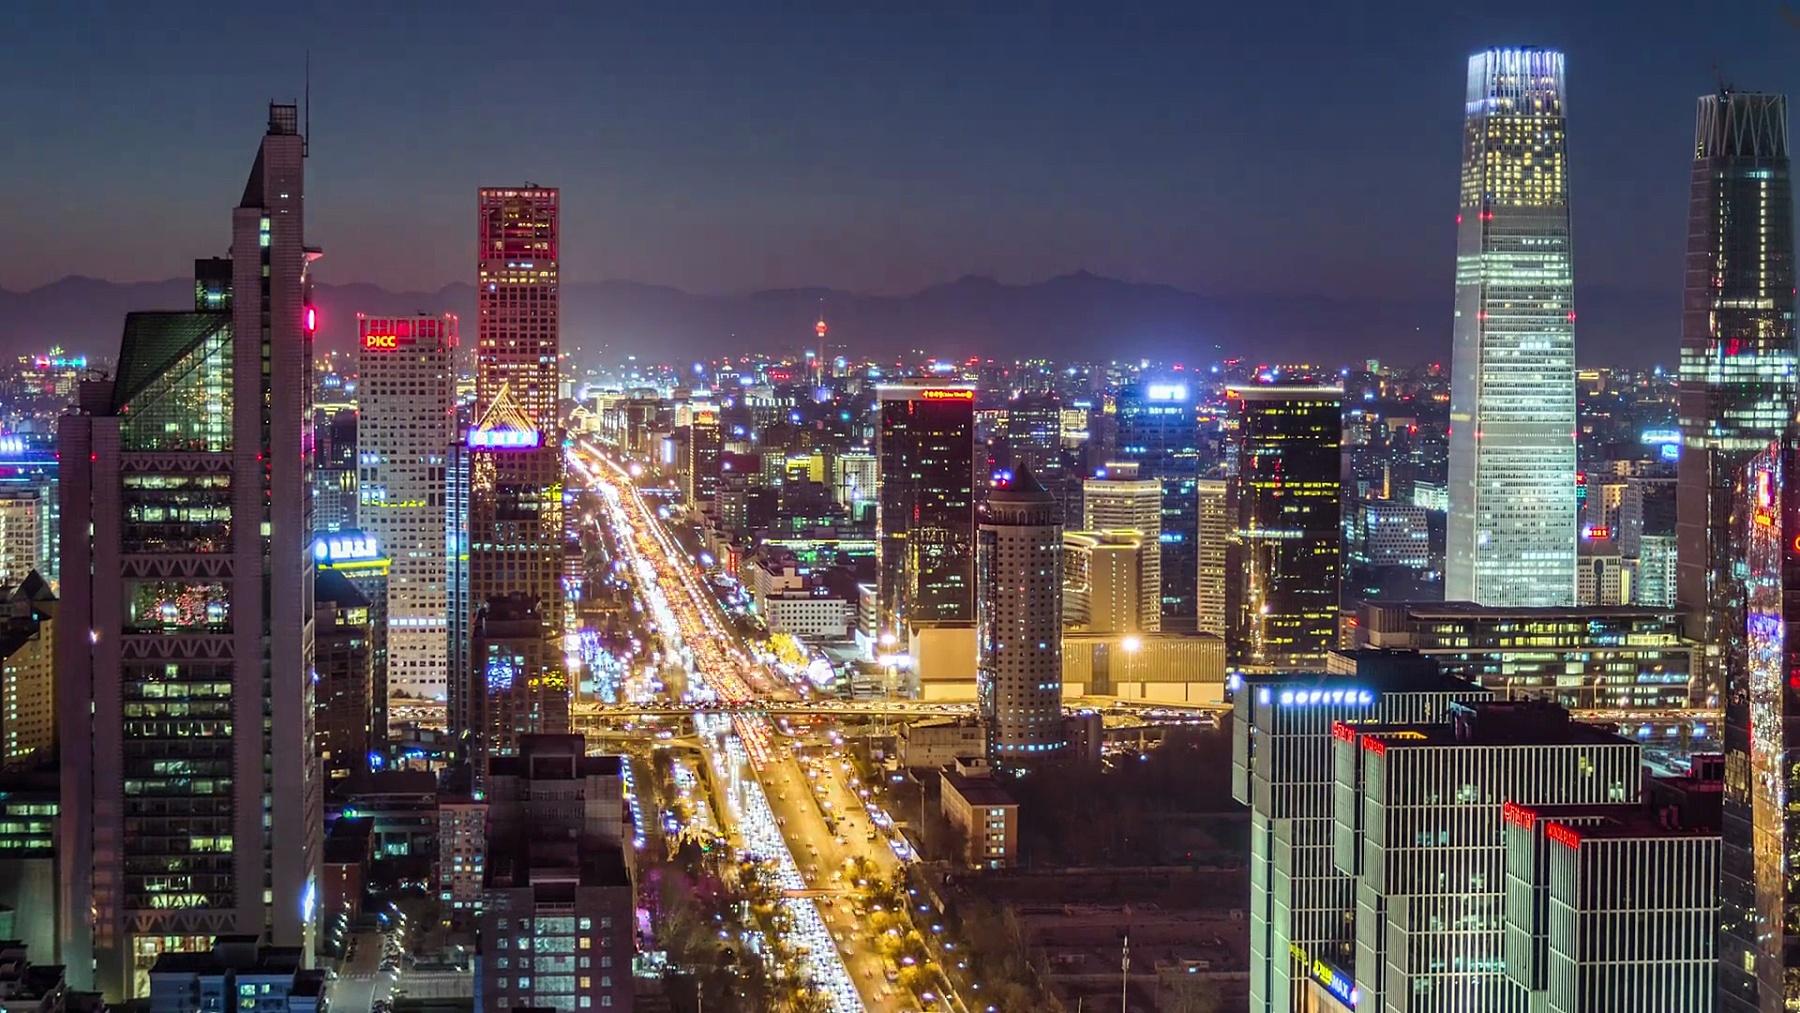 T/L MS HA PAN北京中央商务区鸟瞰